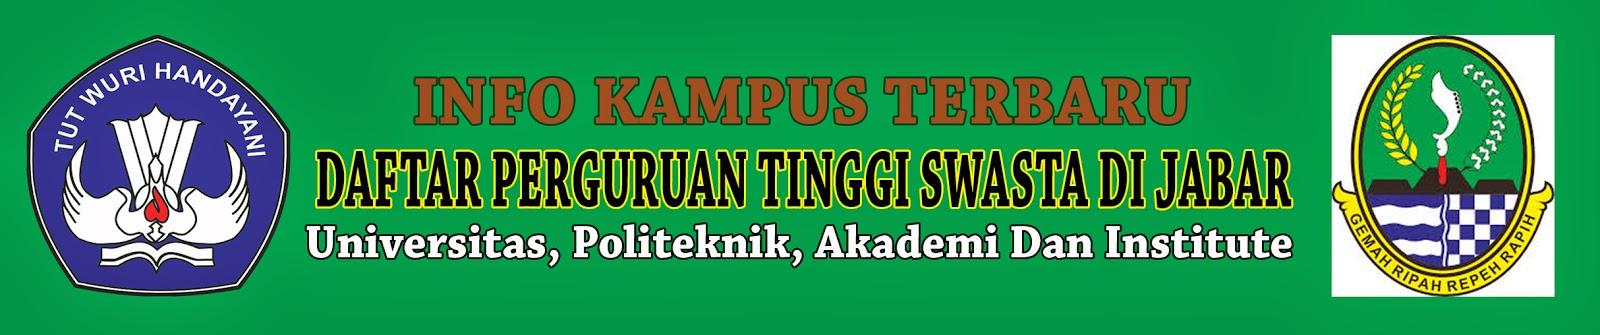 Daftar Perguruan Tinggi Swasta Di Jawa Barat